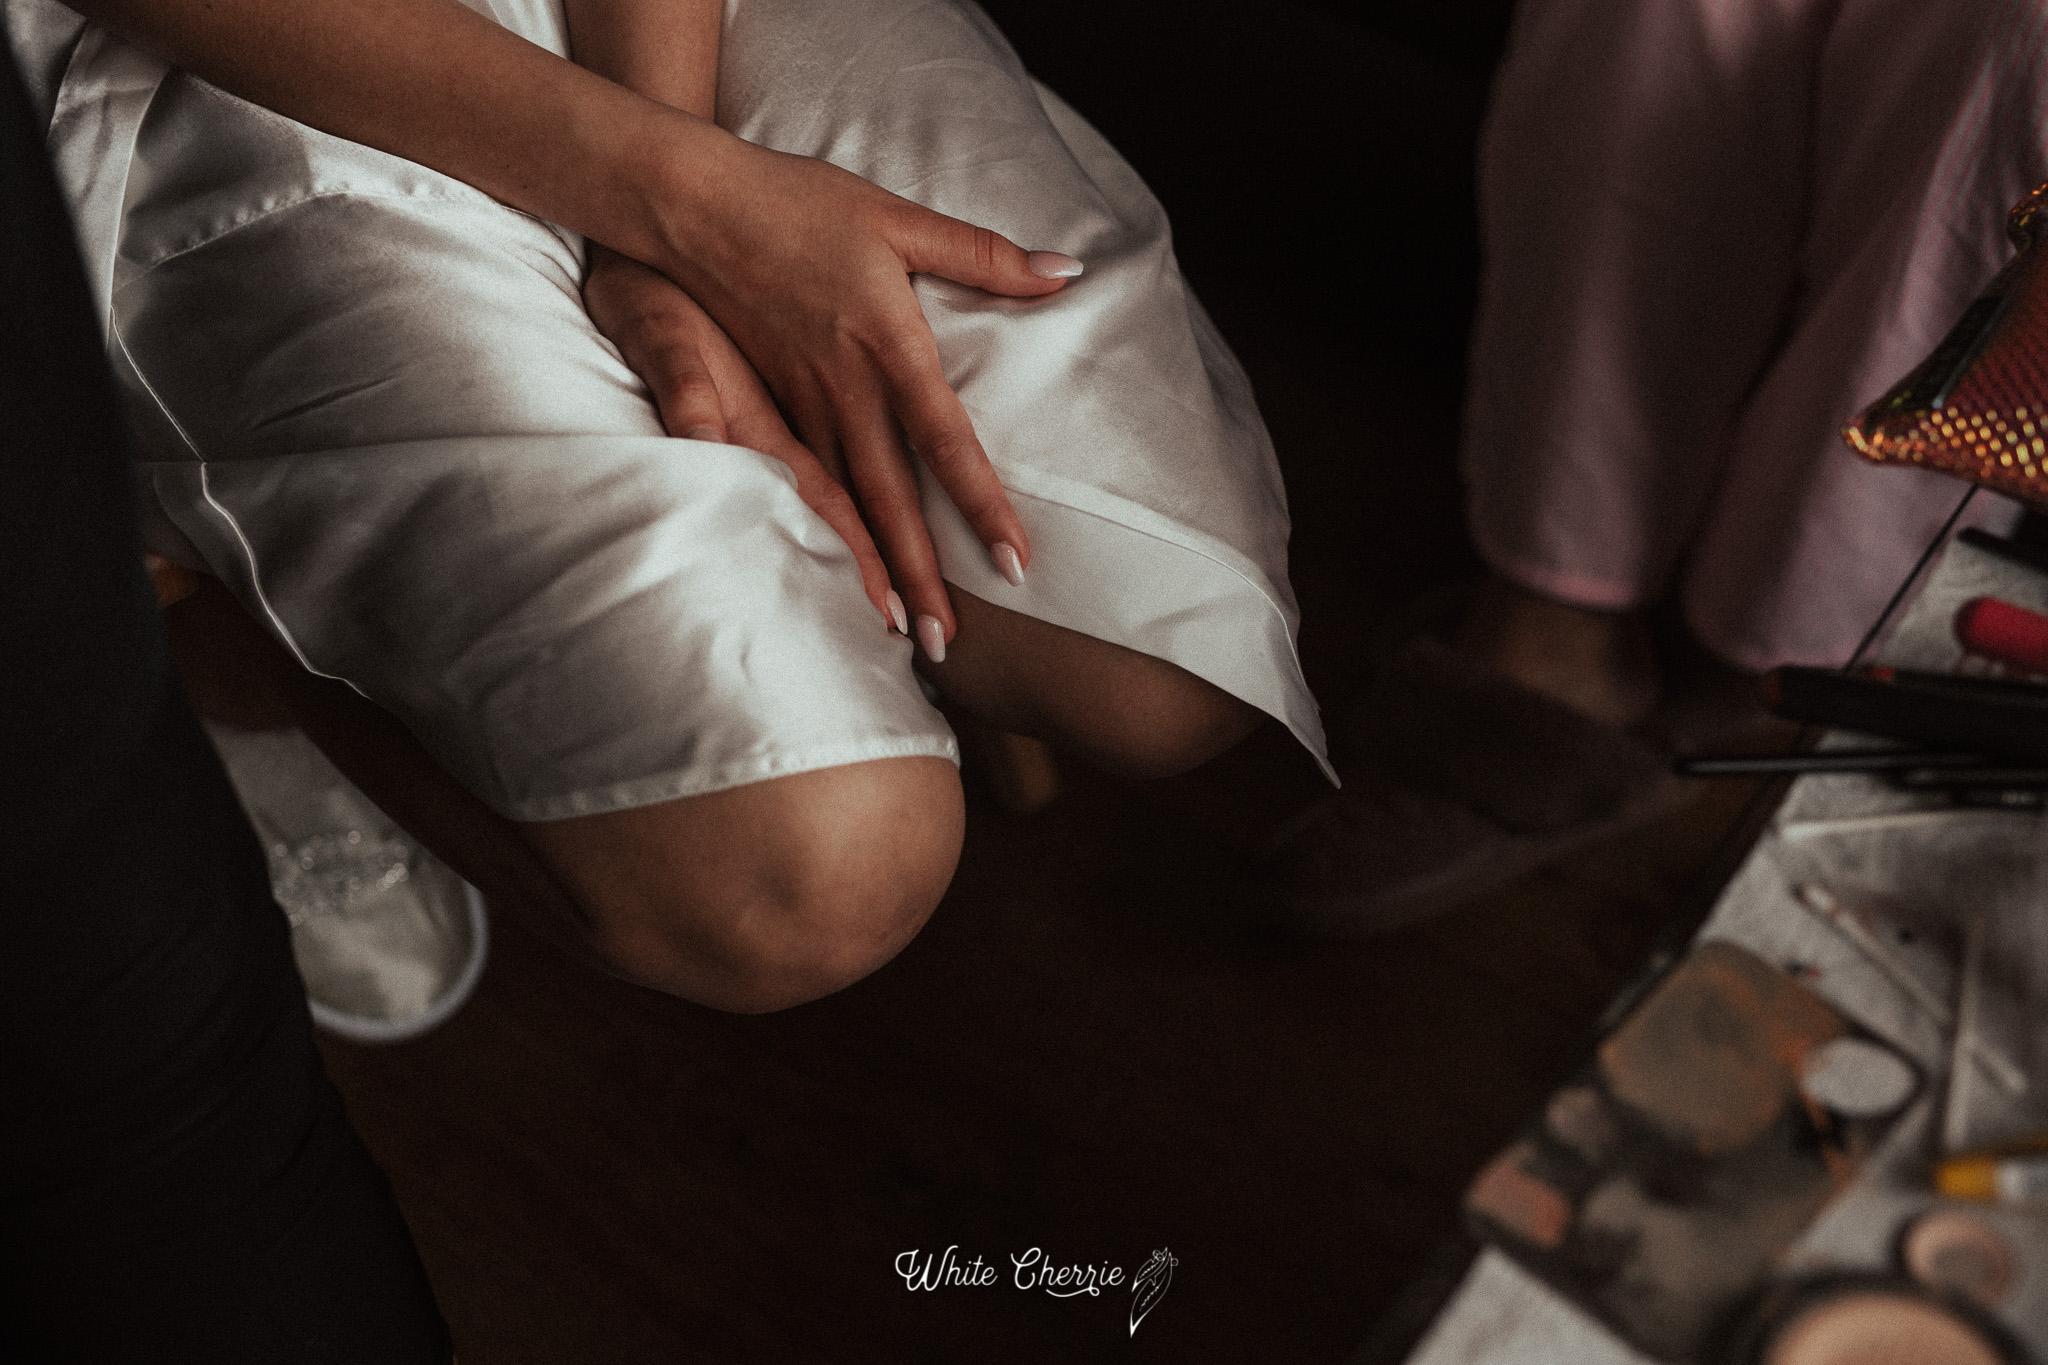 White_Cherrie-Lucy_Ben-7.jpg